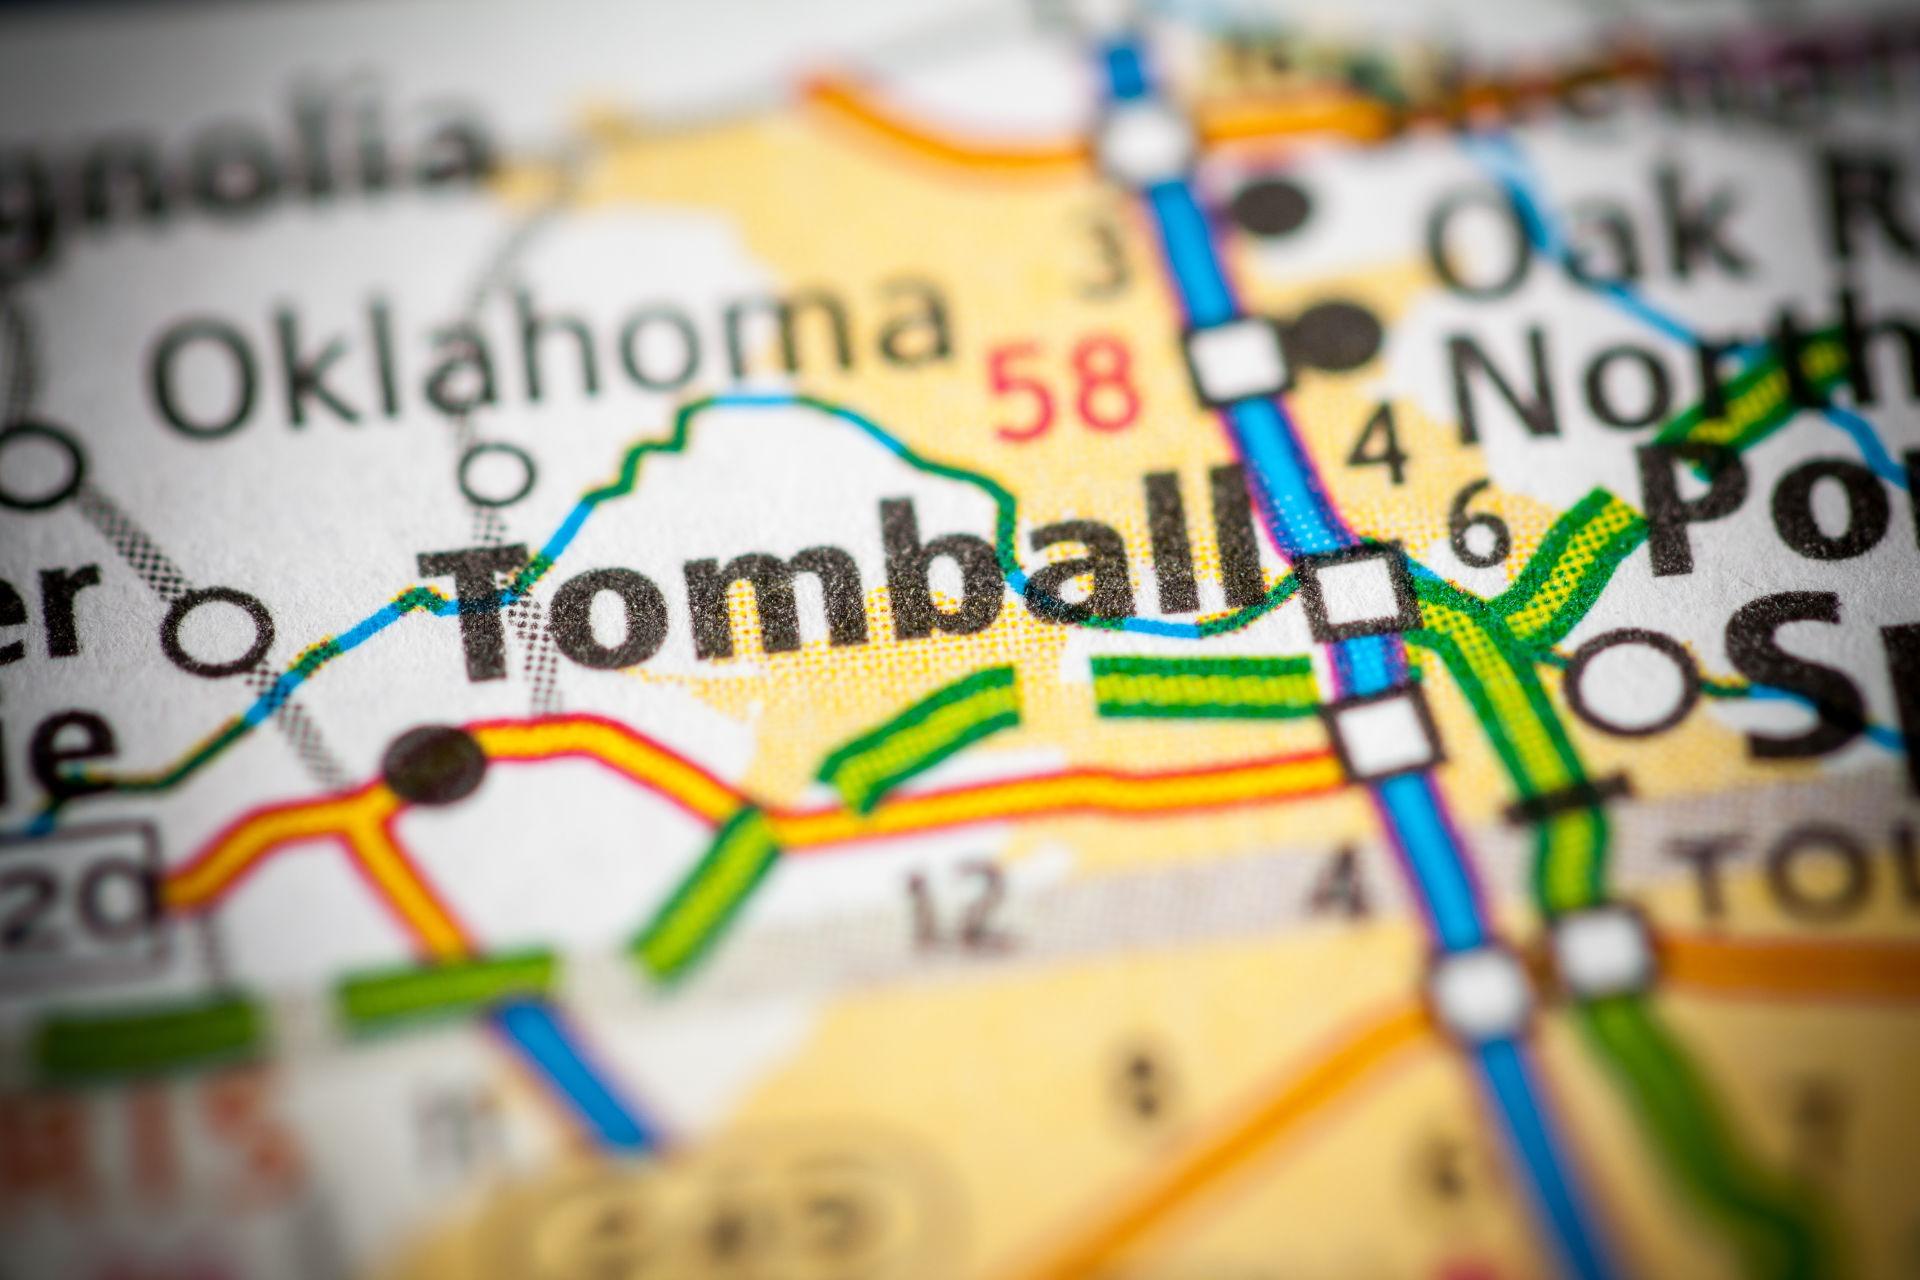 Tomball, Texas